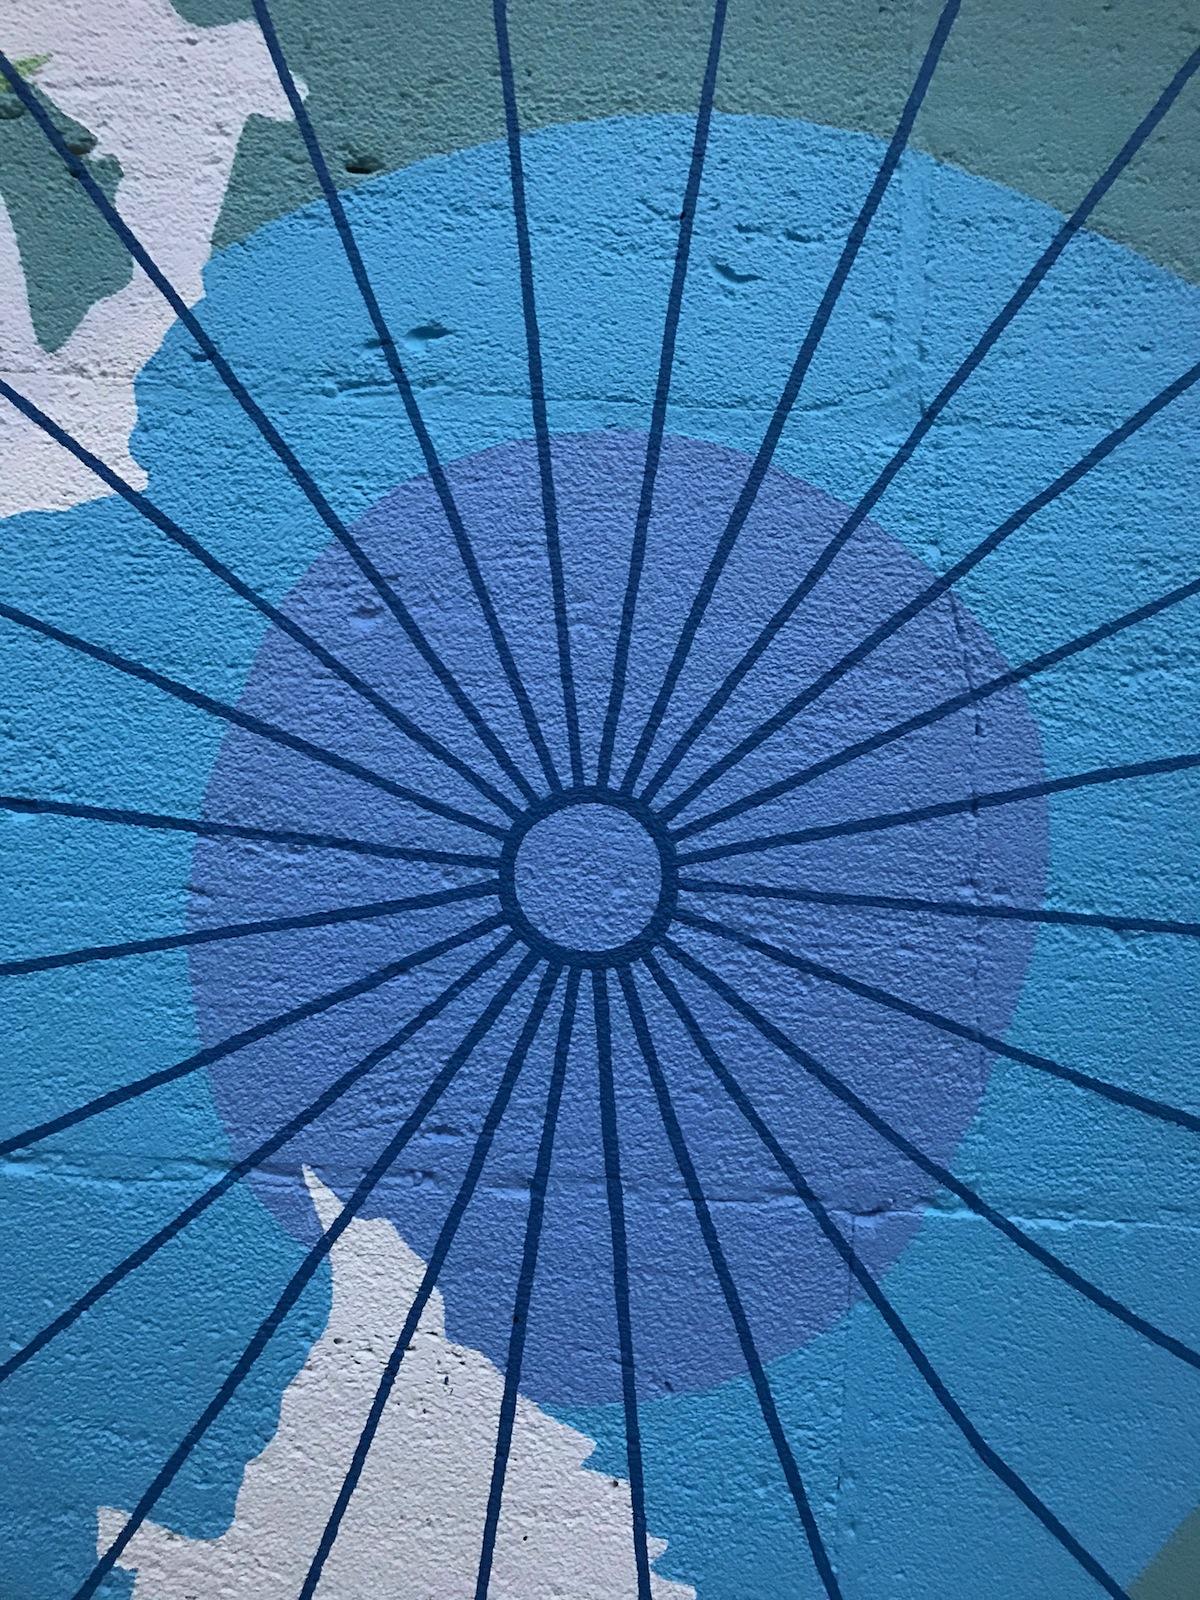 Buckminster_fuller_mural_dymaxion_map-11